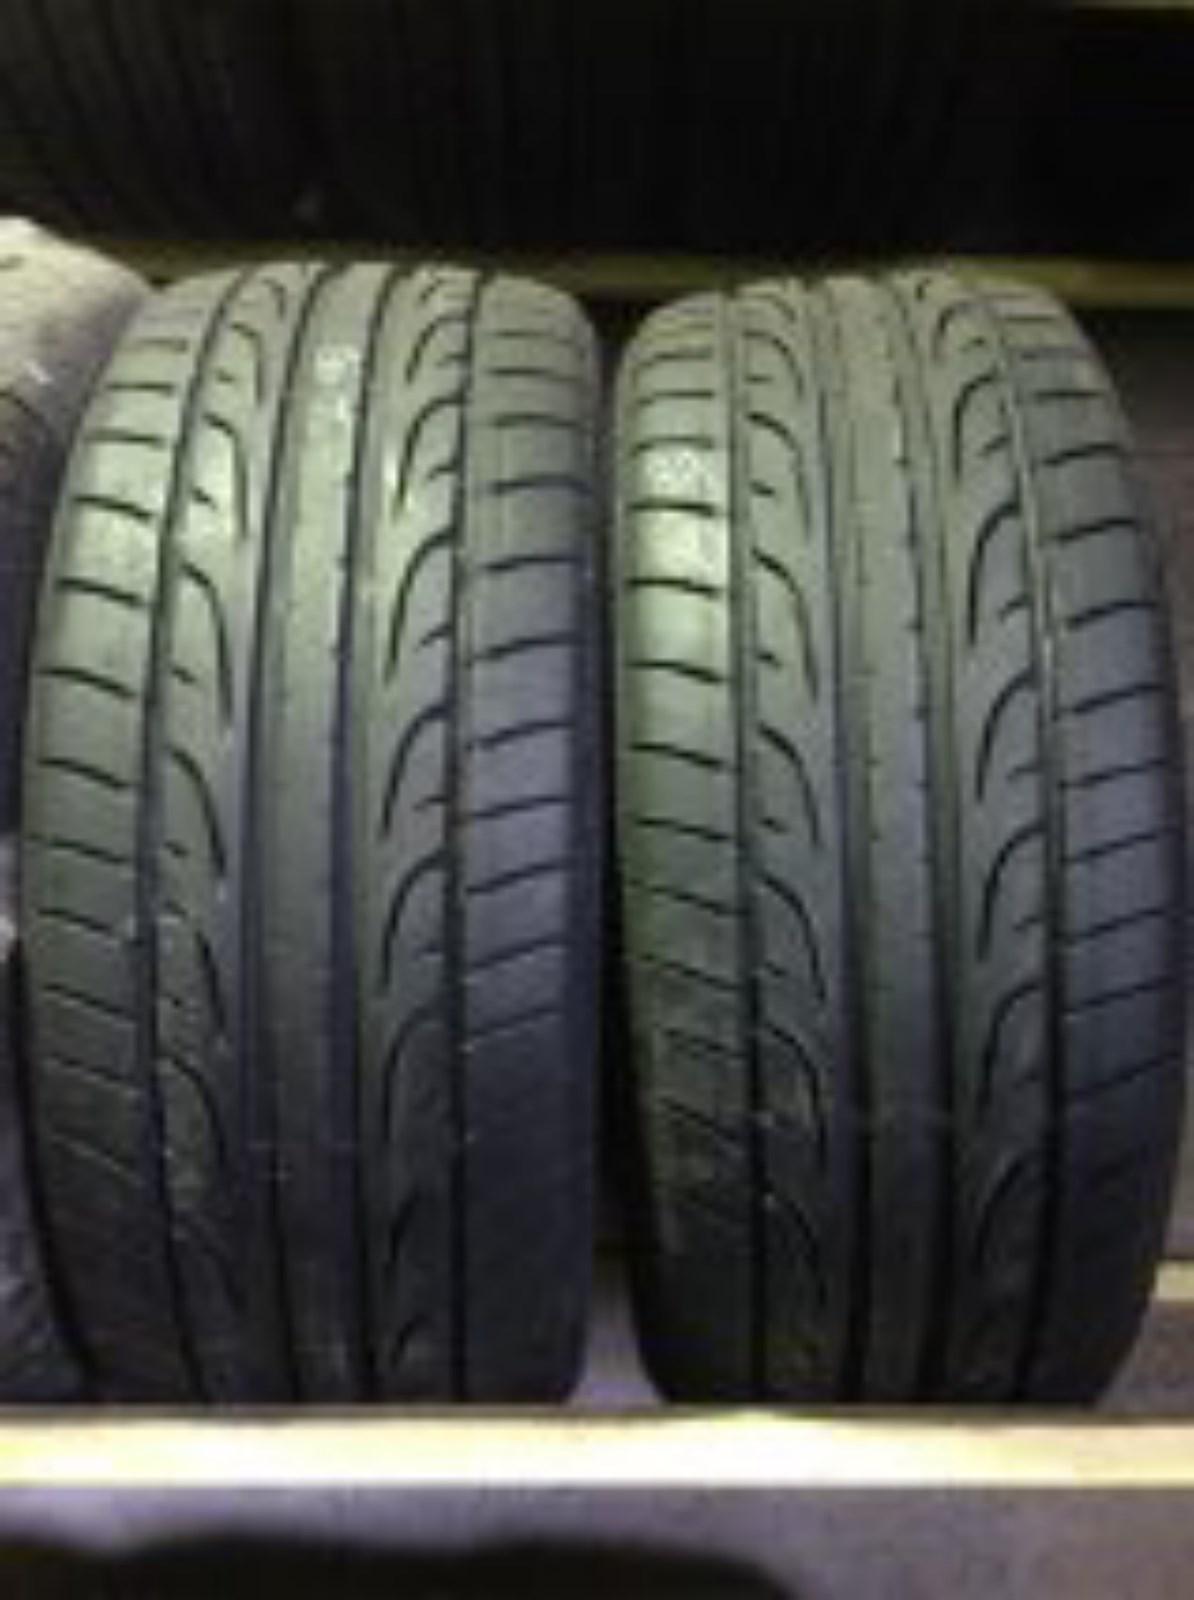 croco pneu nimes pneus moto nimes vente pneus nimes pneu pas cher nimes crocos de n mes. Black Bedroom Furniture Sets. Home Design Ideas